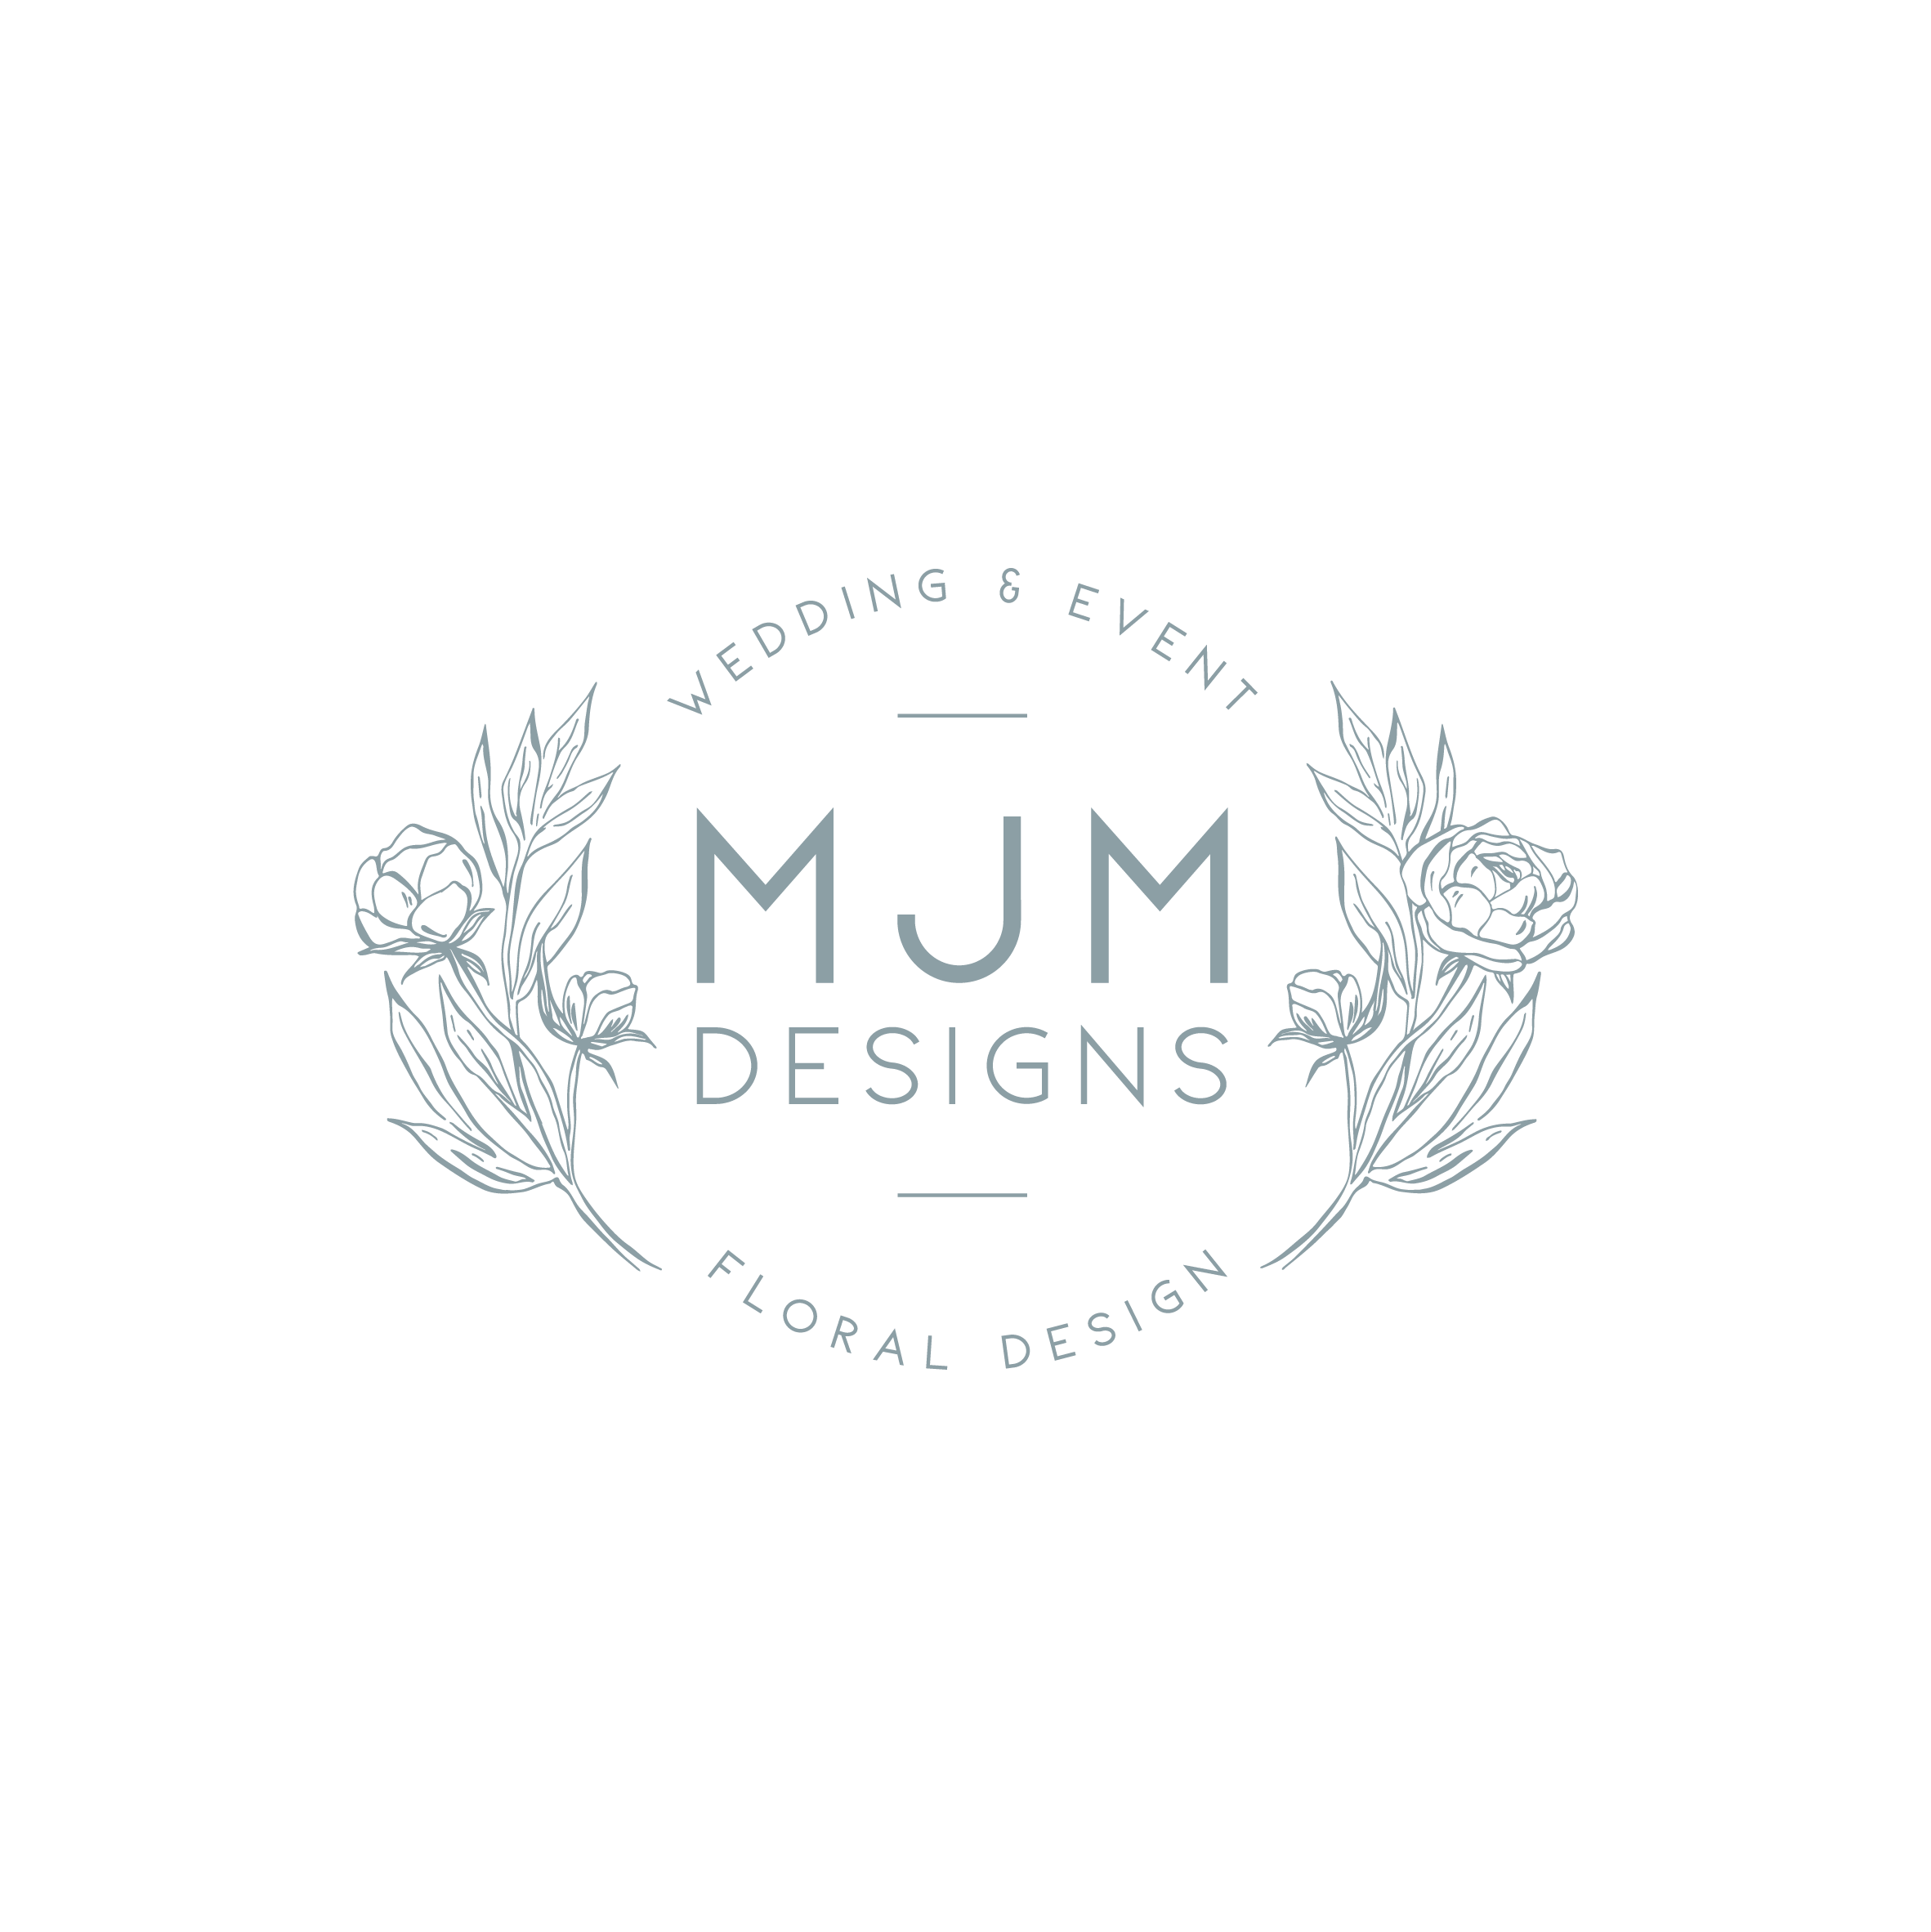 MJM Designs